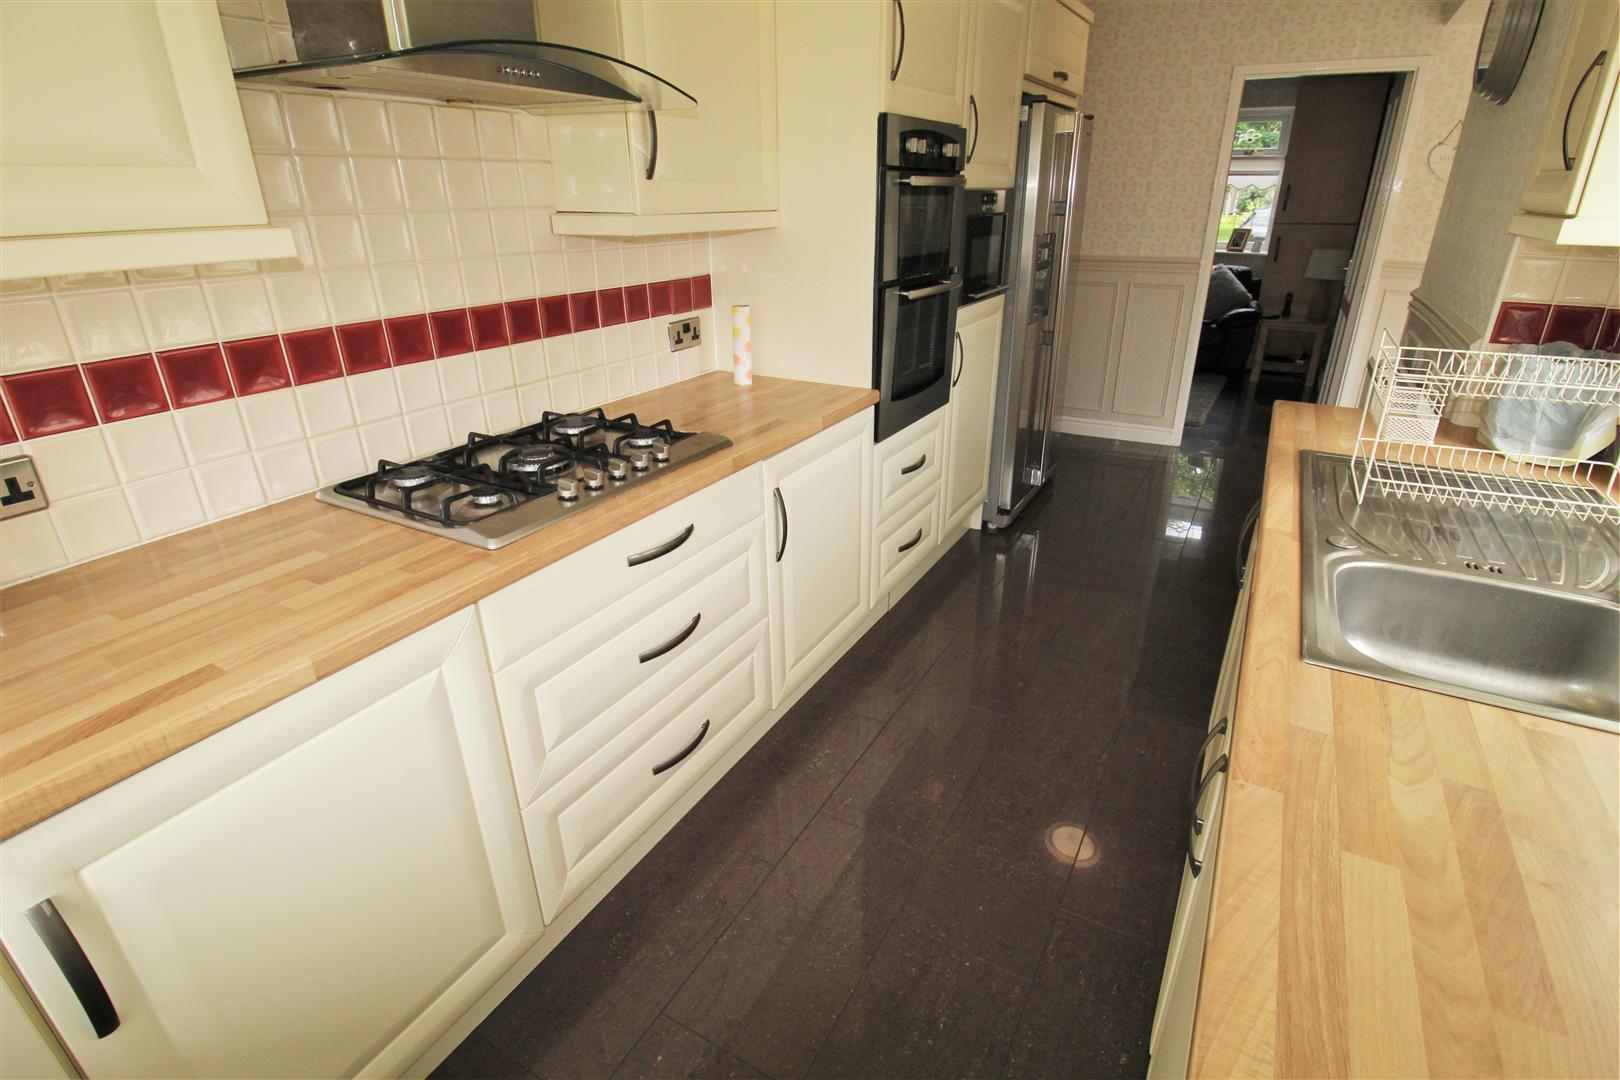 3 Bedrooms, House - Semi-Detached, Greenside Avenue, Aintree, Liverpool